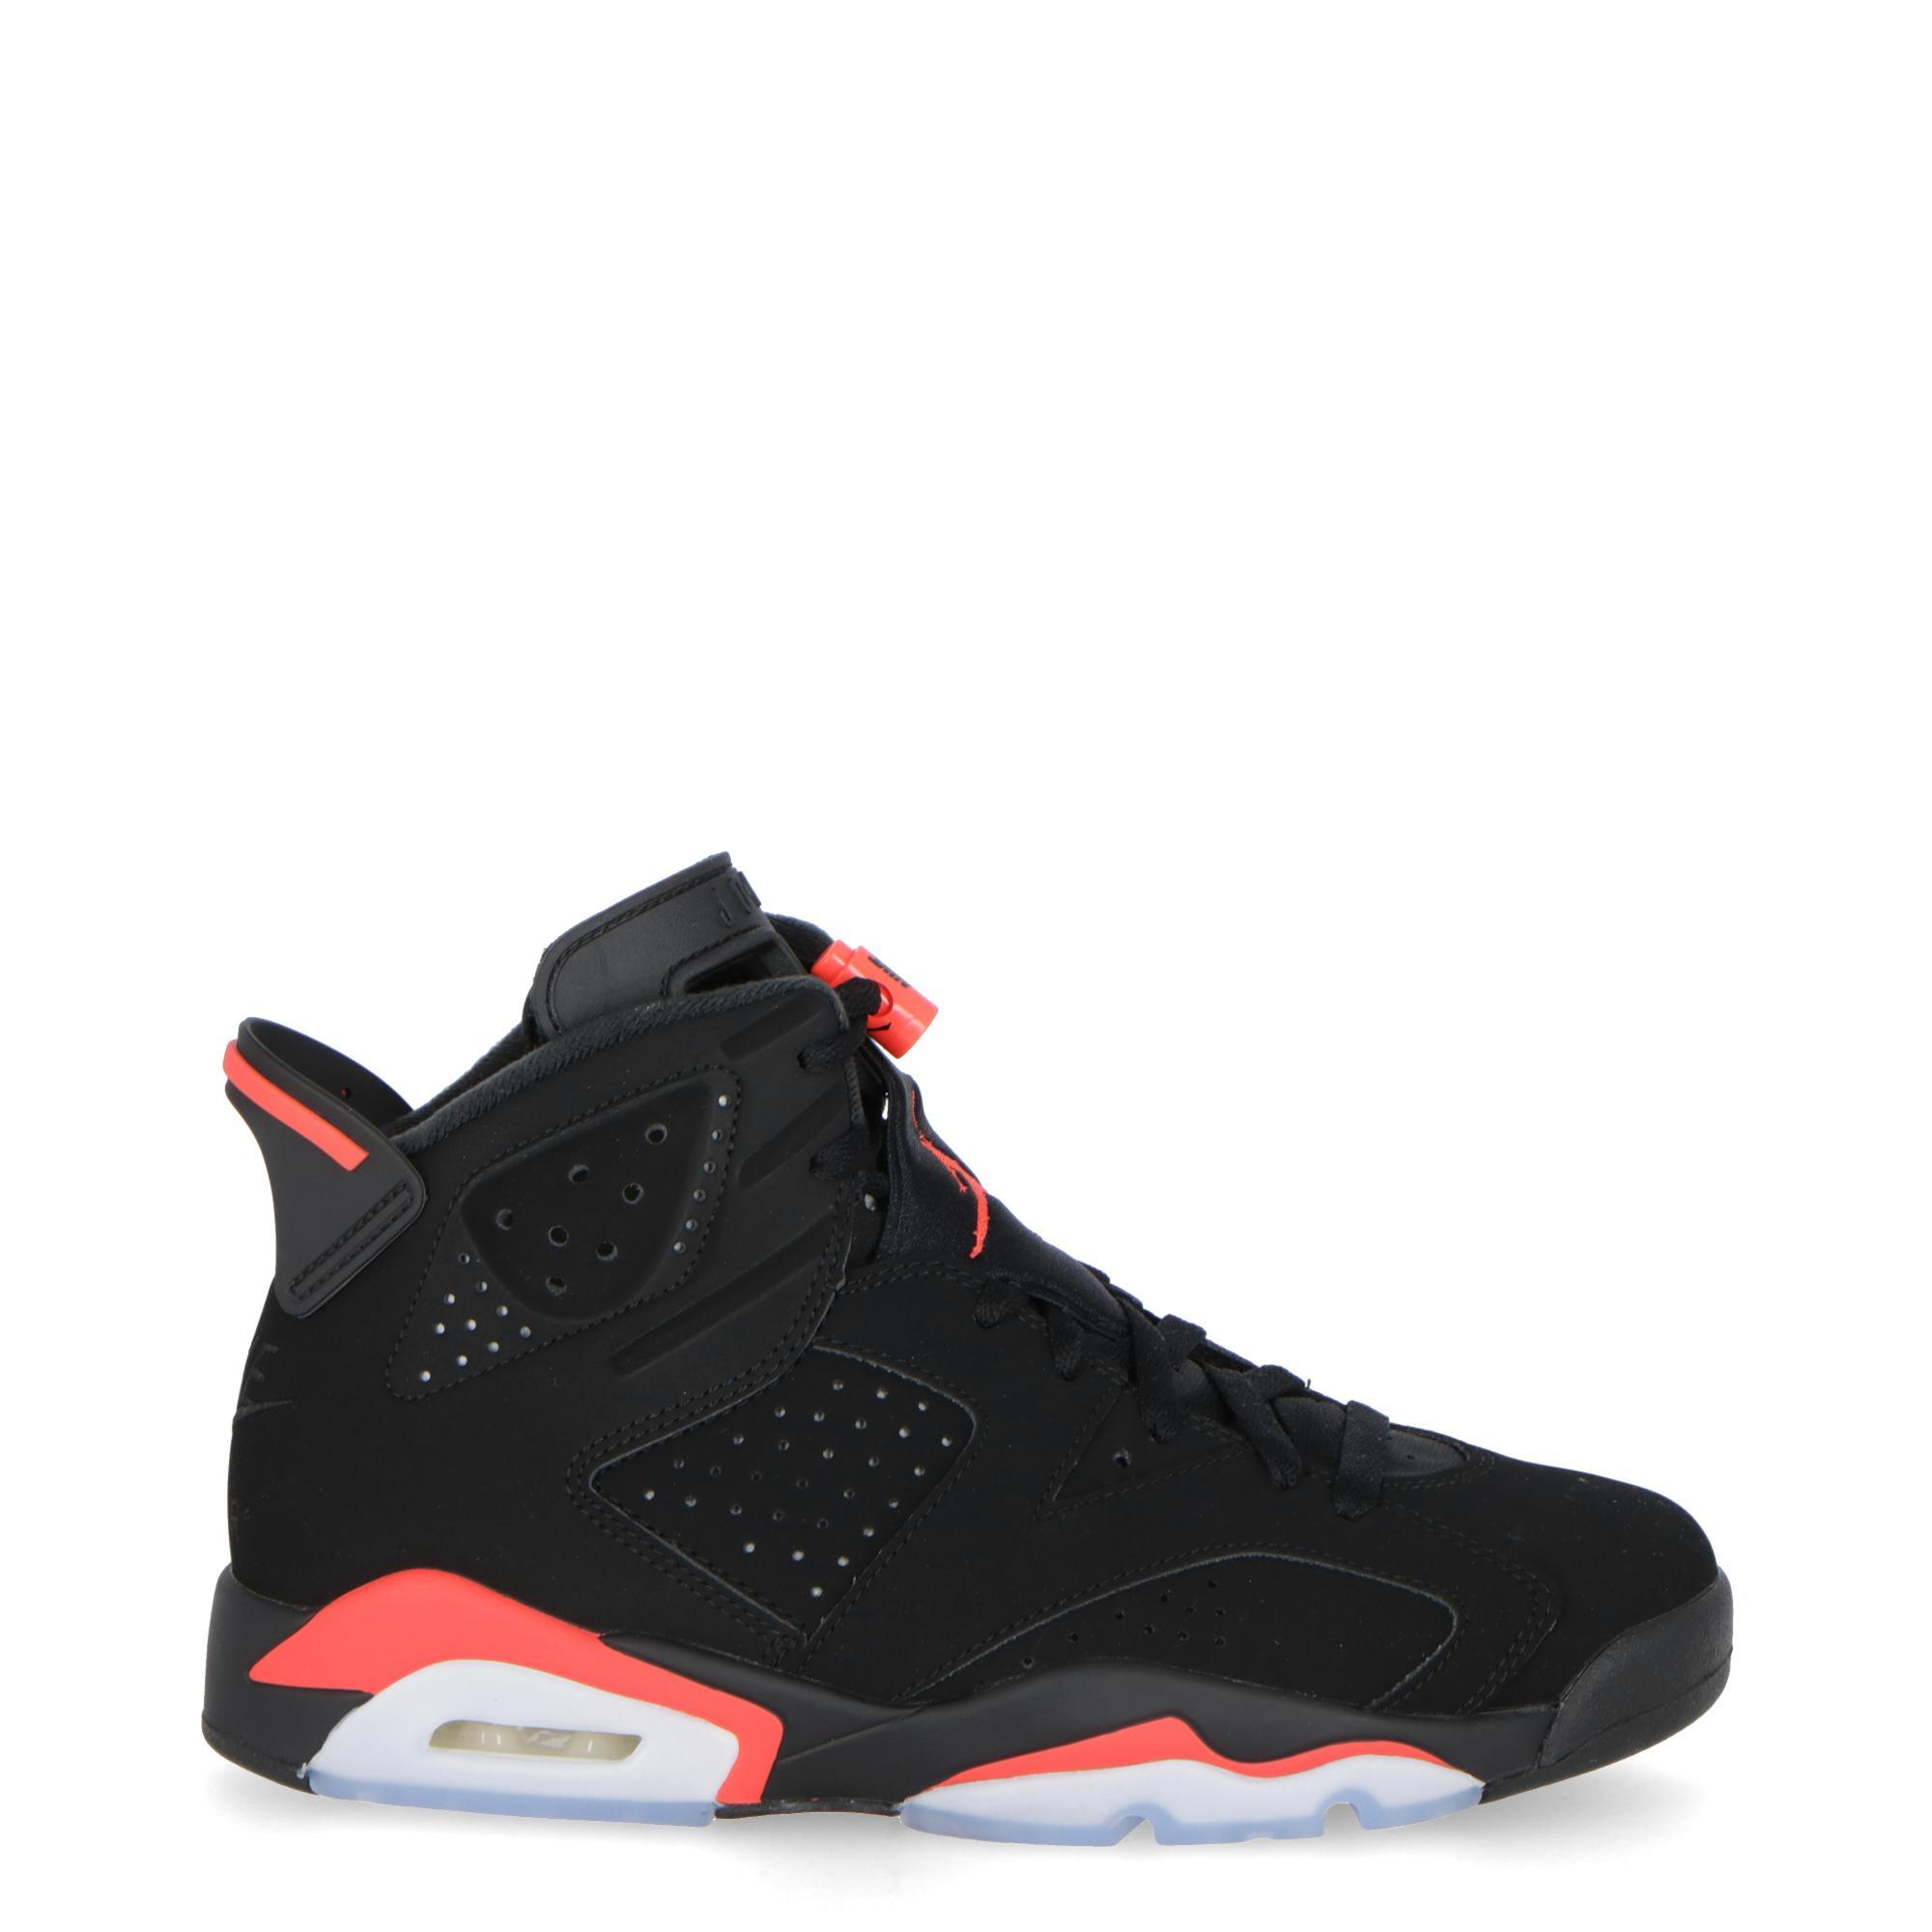 Jordan Infrared Black 6 Treesse Retro Nike Air X1wUq5xxB